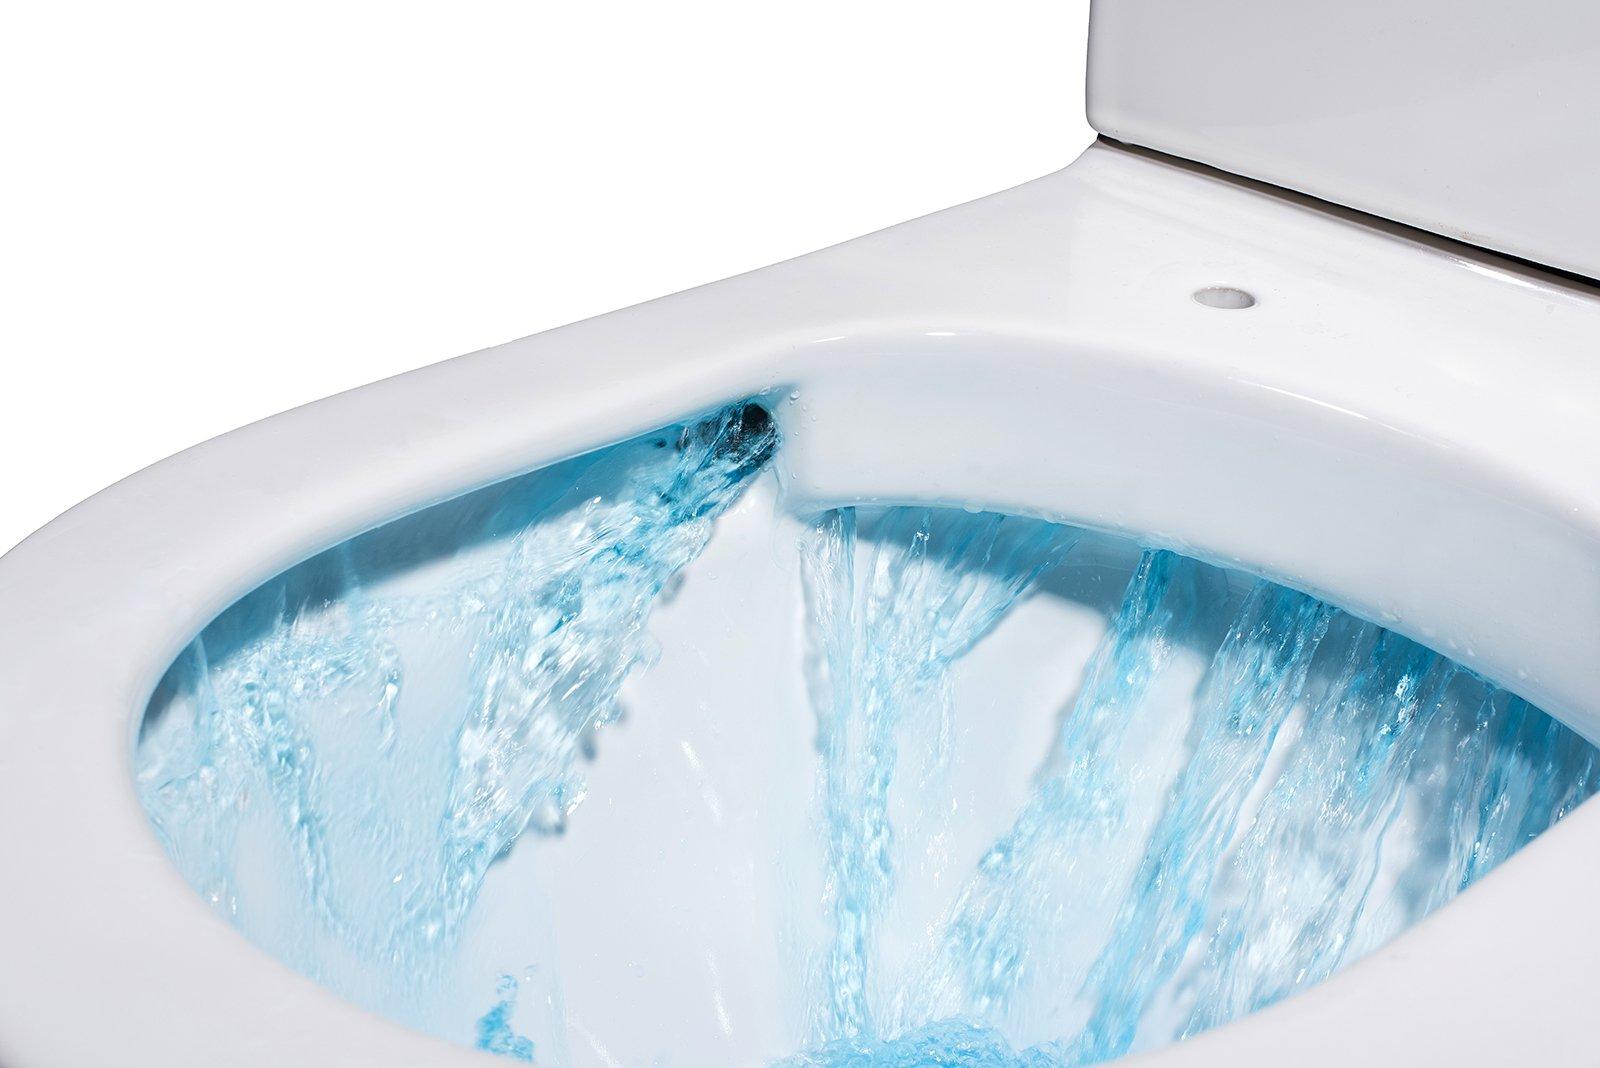 Spülrandloses Wand-Hänge WC B-8030R Weiß - mit Nano-Beschichtung - inkl. Softclose-Deckel zoom thumbnail 4